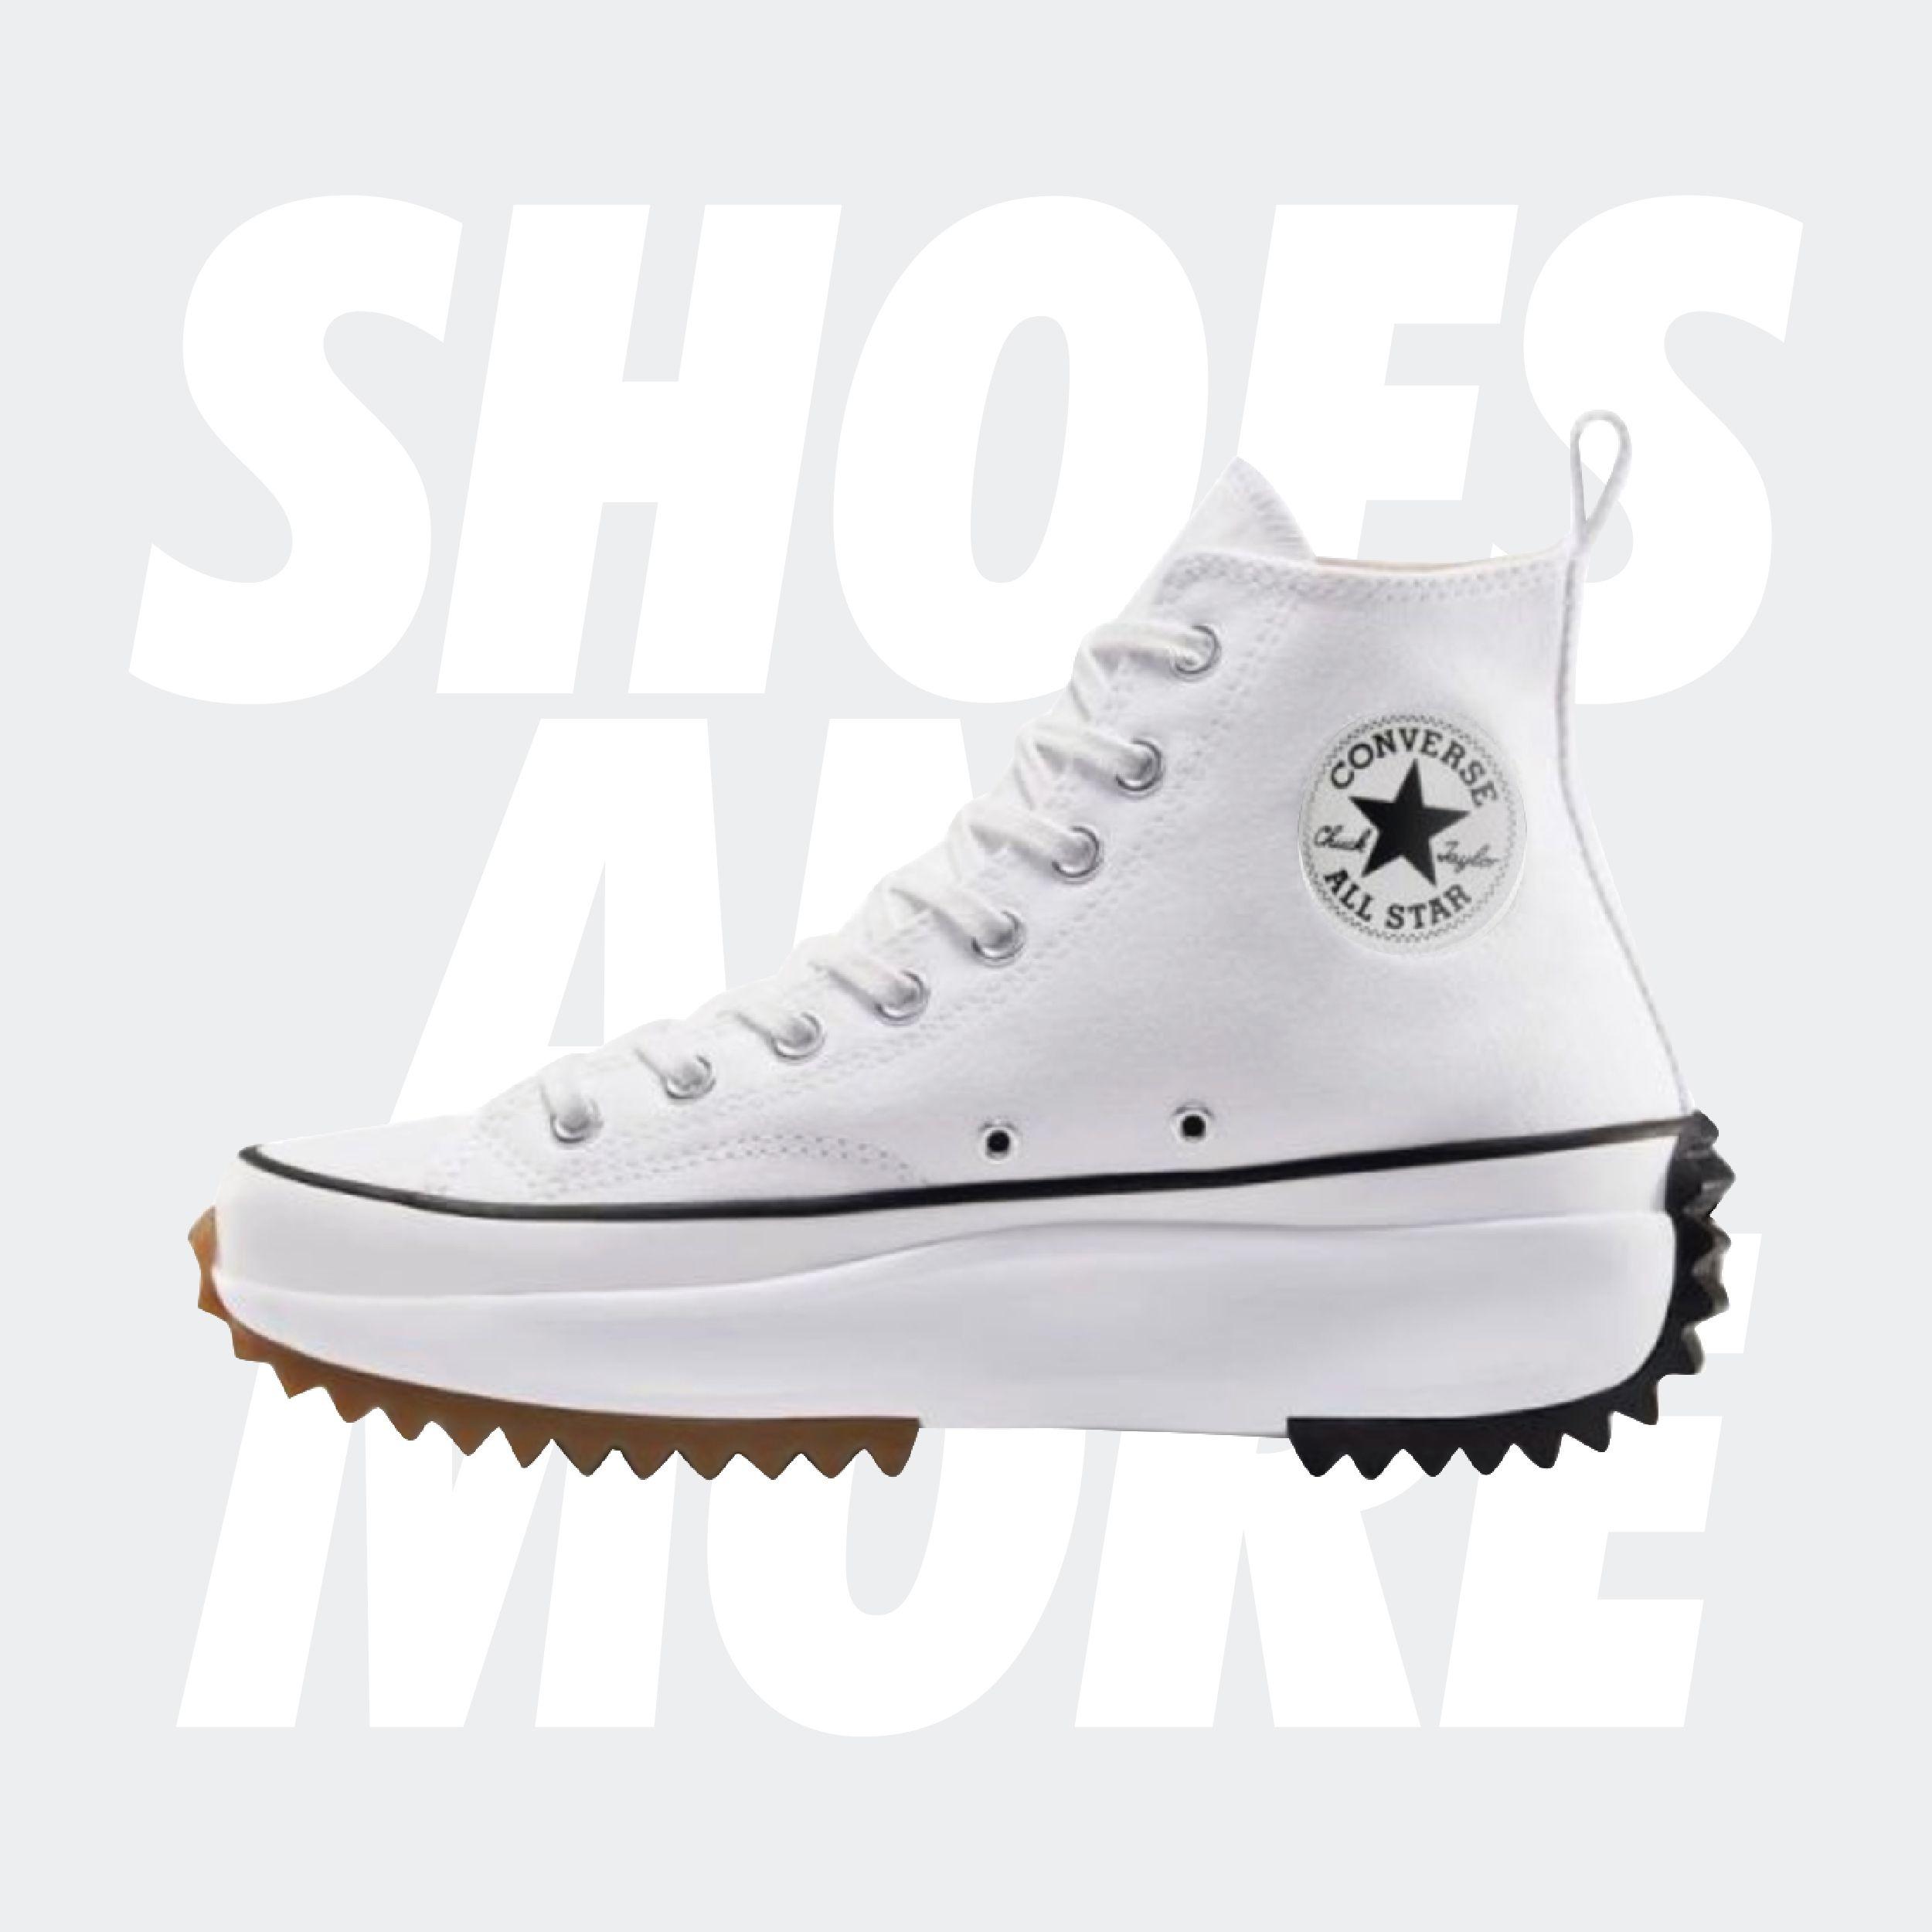 lector arma intercambiar  Converse All Star baratas 25€ - Envío Gratis| Shoes and More